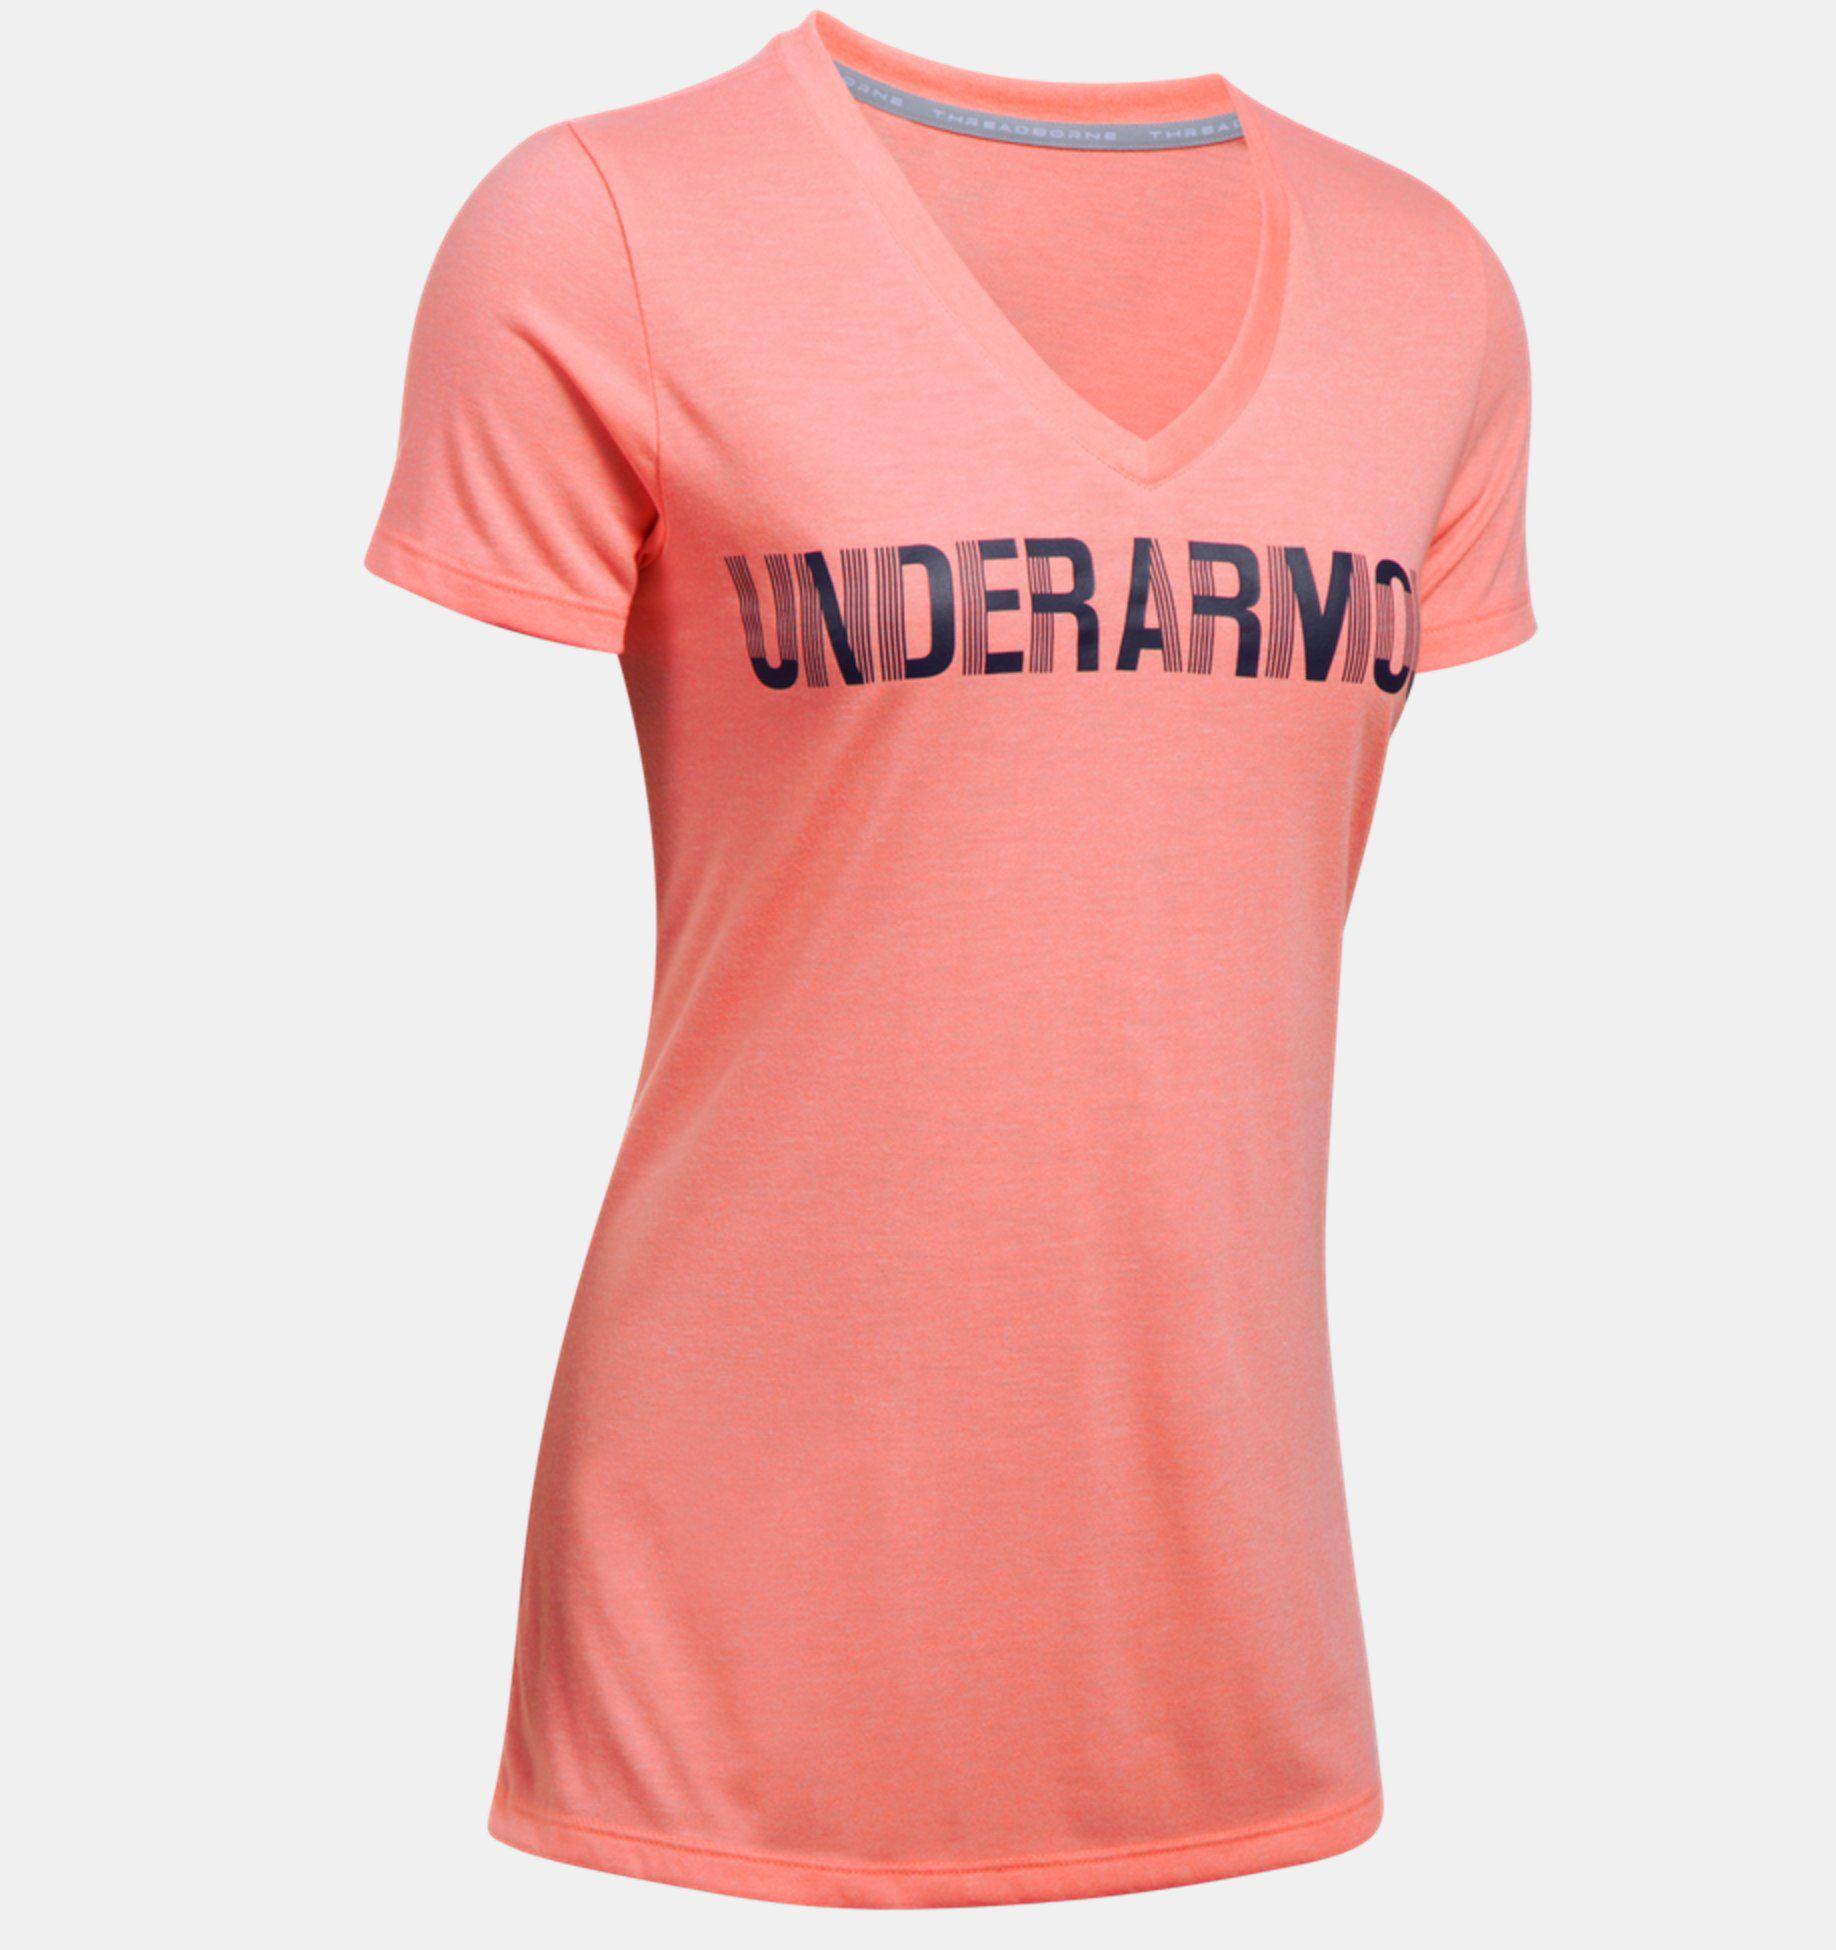 c5cf3711818 Camiseta Feminina Under Armour Threadborne v - BRACIA SHOP  Loja de ...